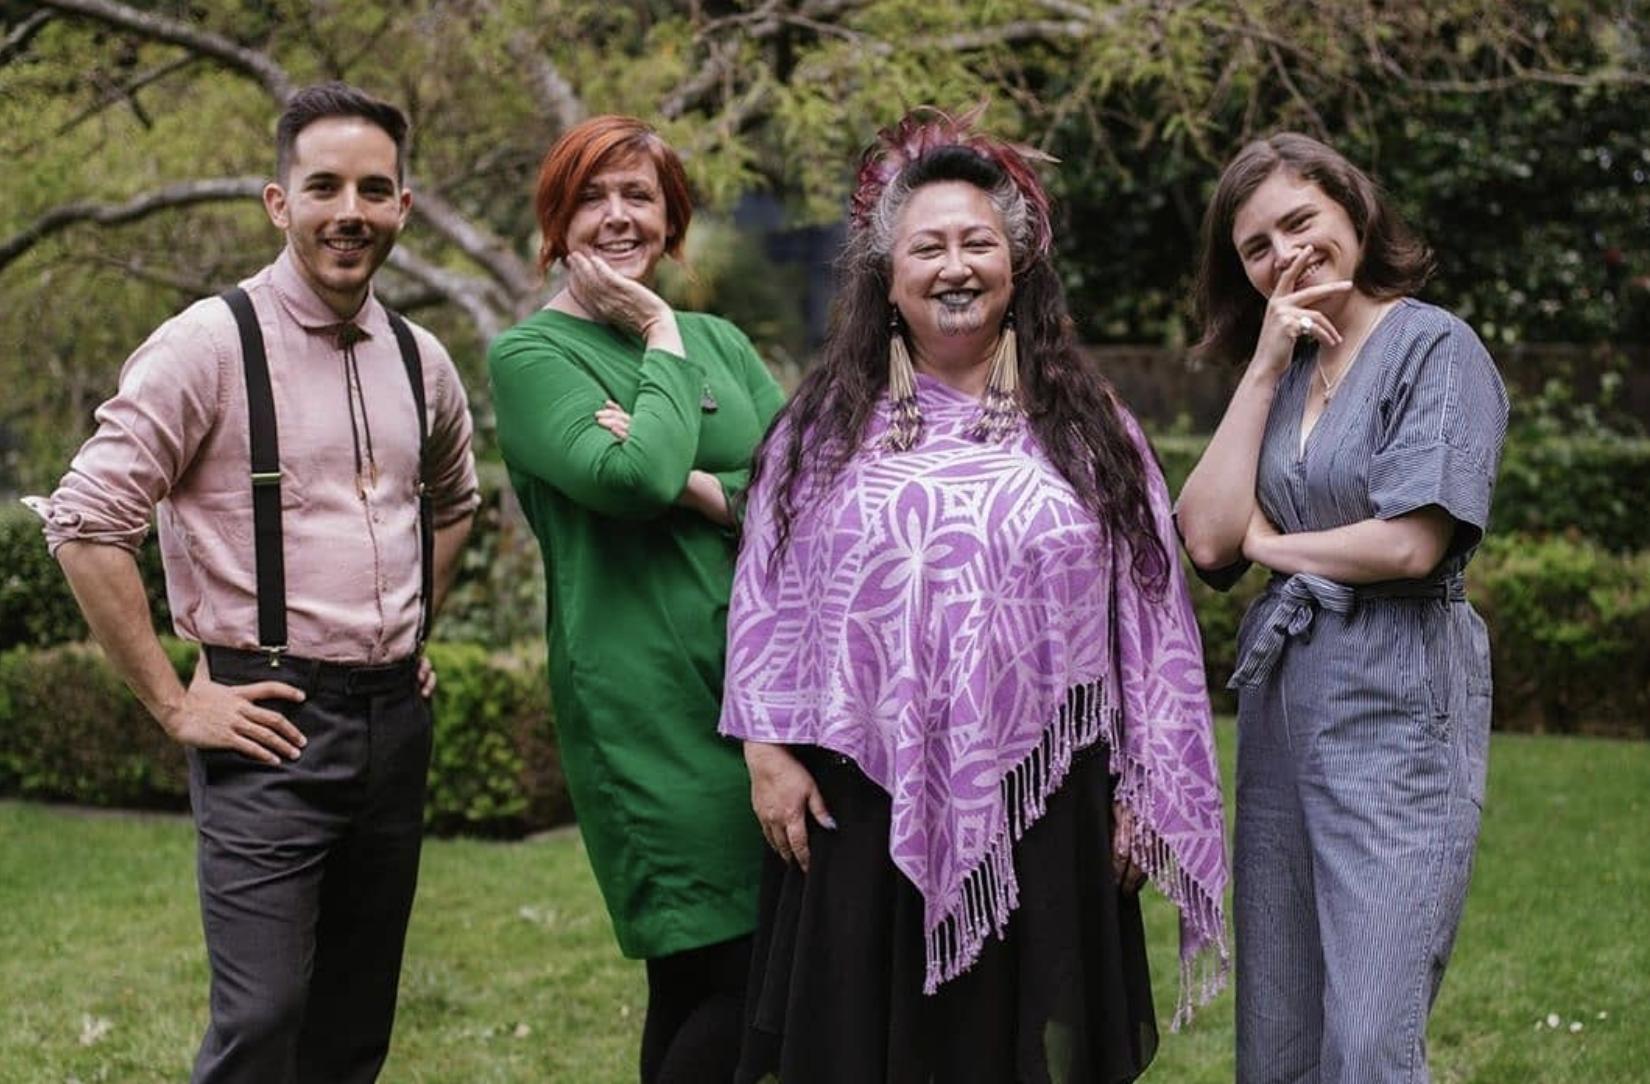 Jan Logie in green dress posing alongside 3 other Green party MPs: Chlöe Swarbrick (far right), Elizabeth Kerekere (centre right) and Ricardo Mene�ndez March (far left), credit to @younggreensnz instagram.